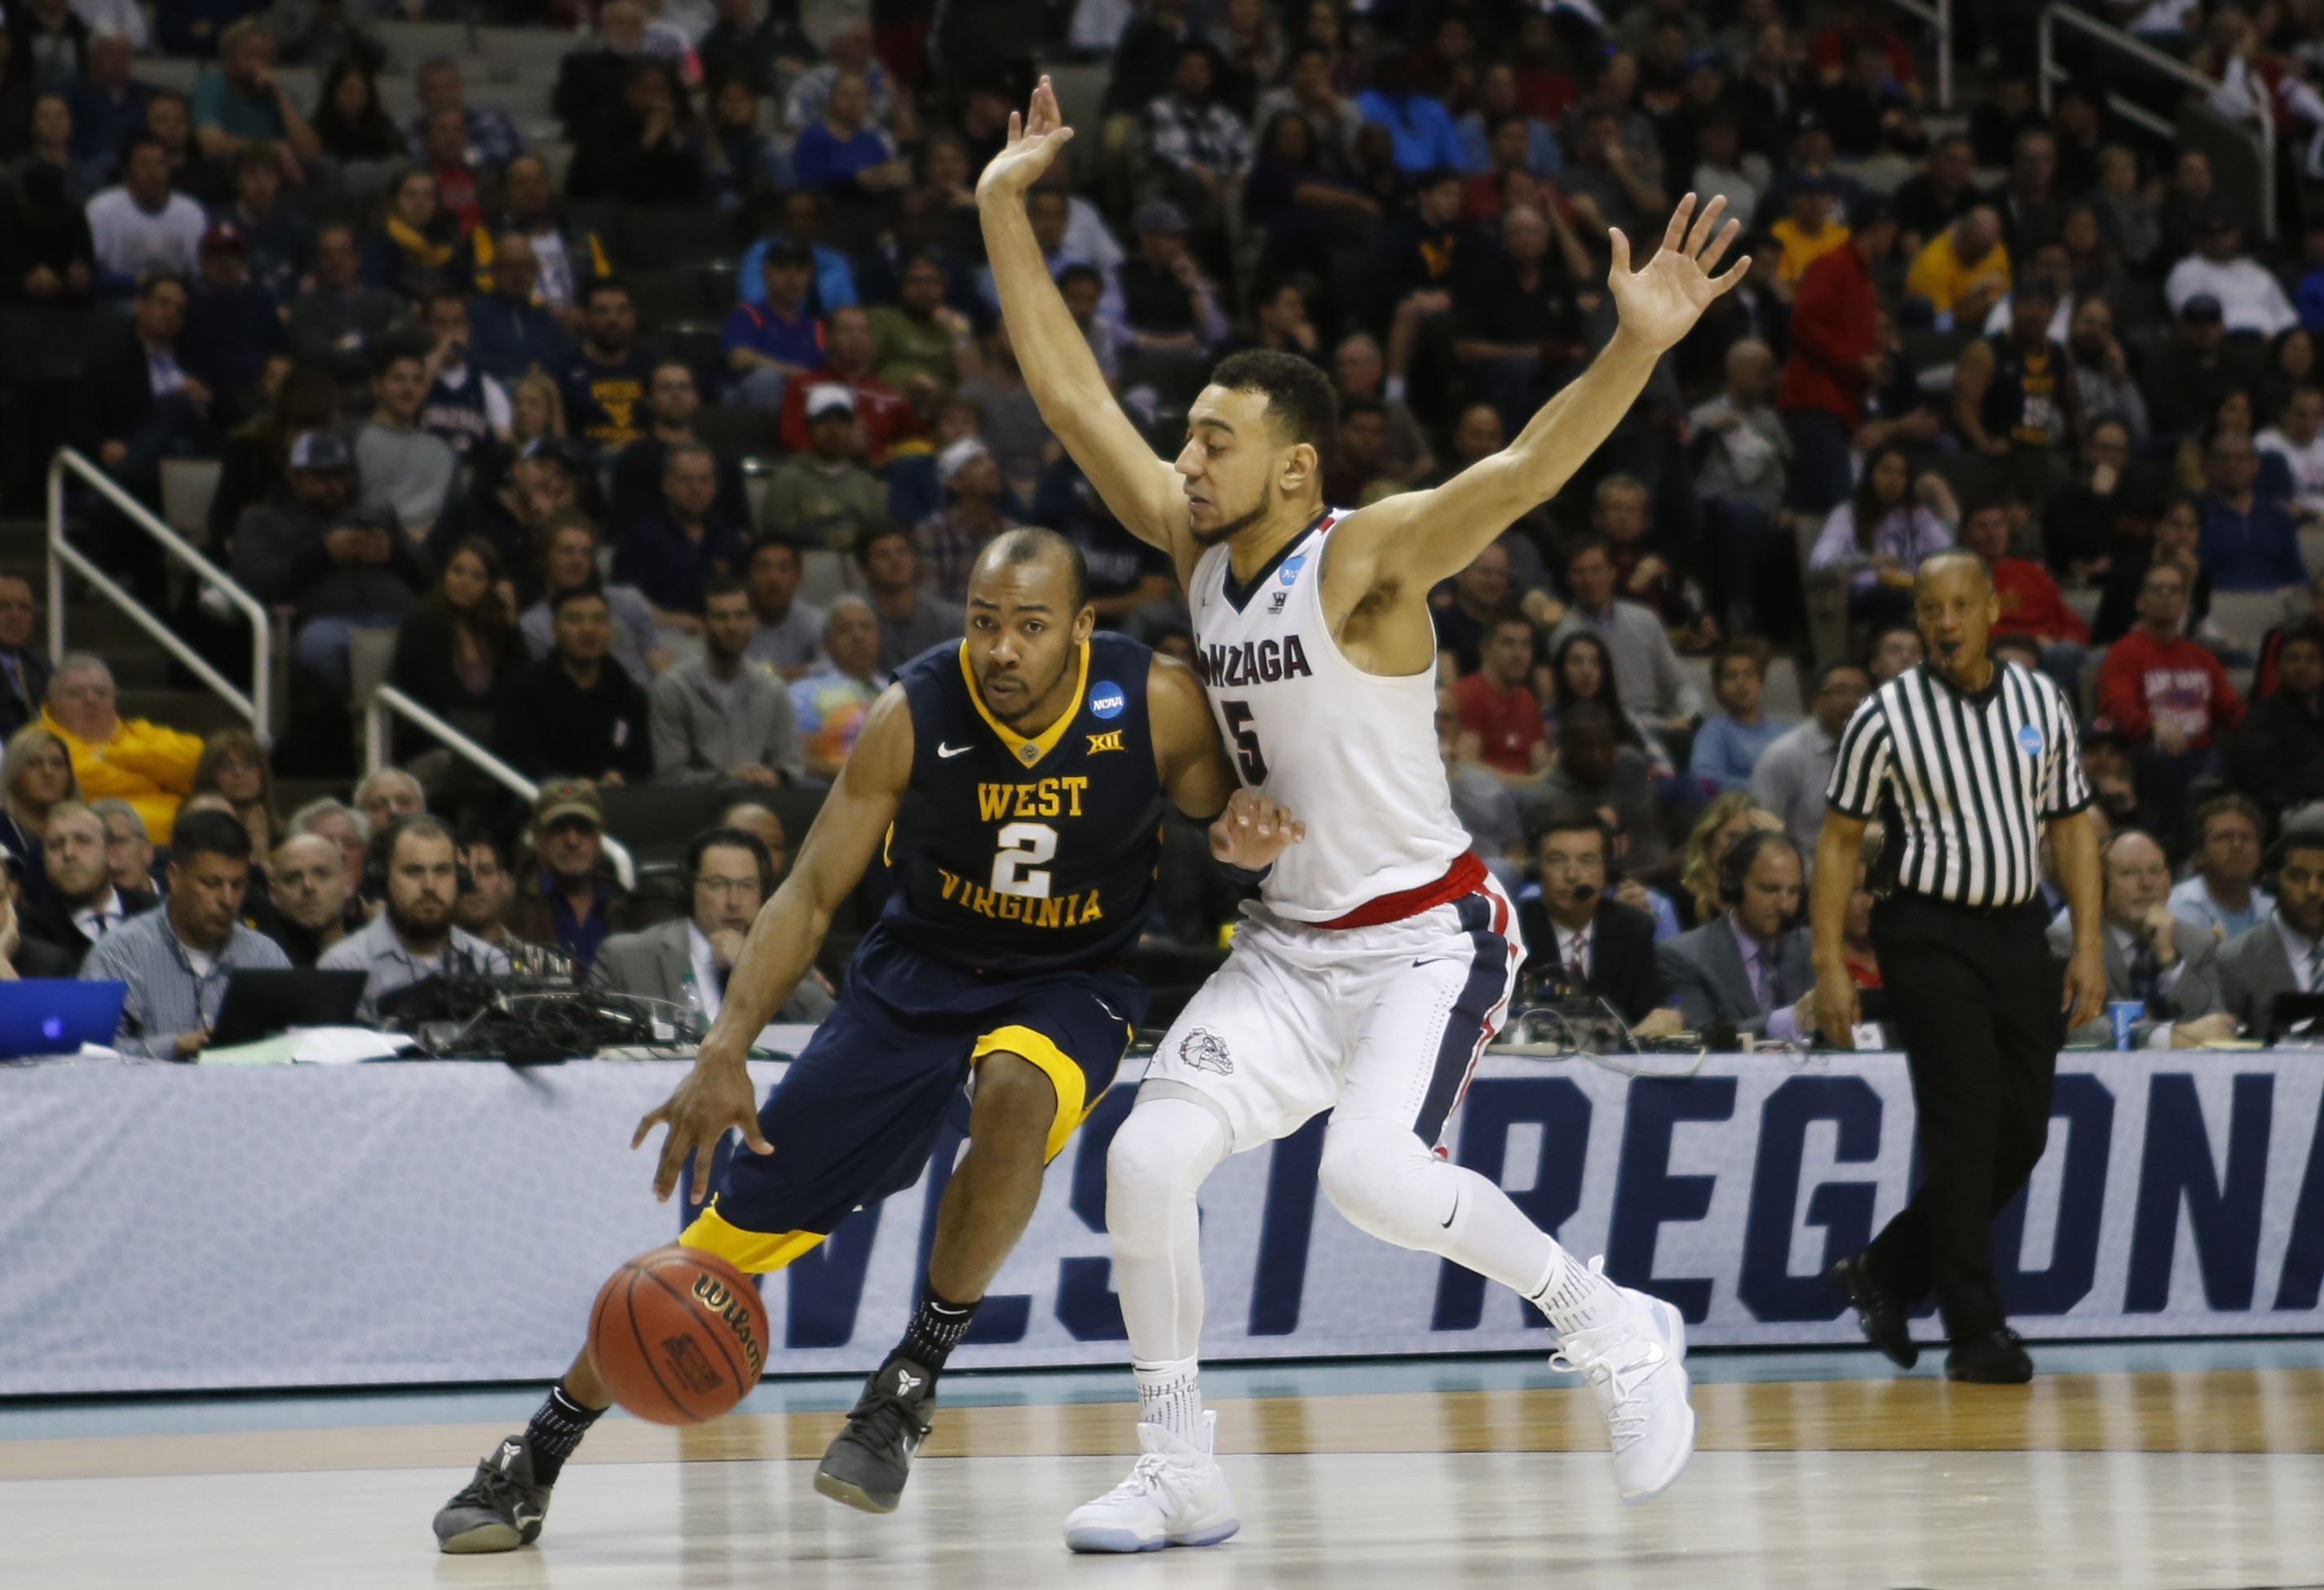 9966685-ncaa-basketball-ncaa-tournament-west-regional-gonzaga-vs-west-virginia